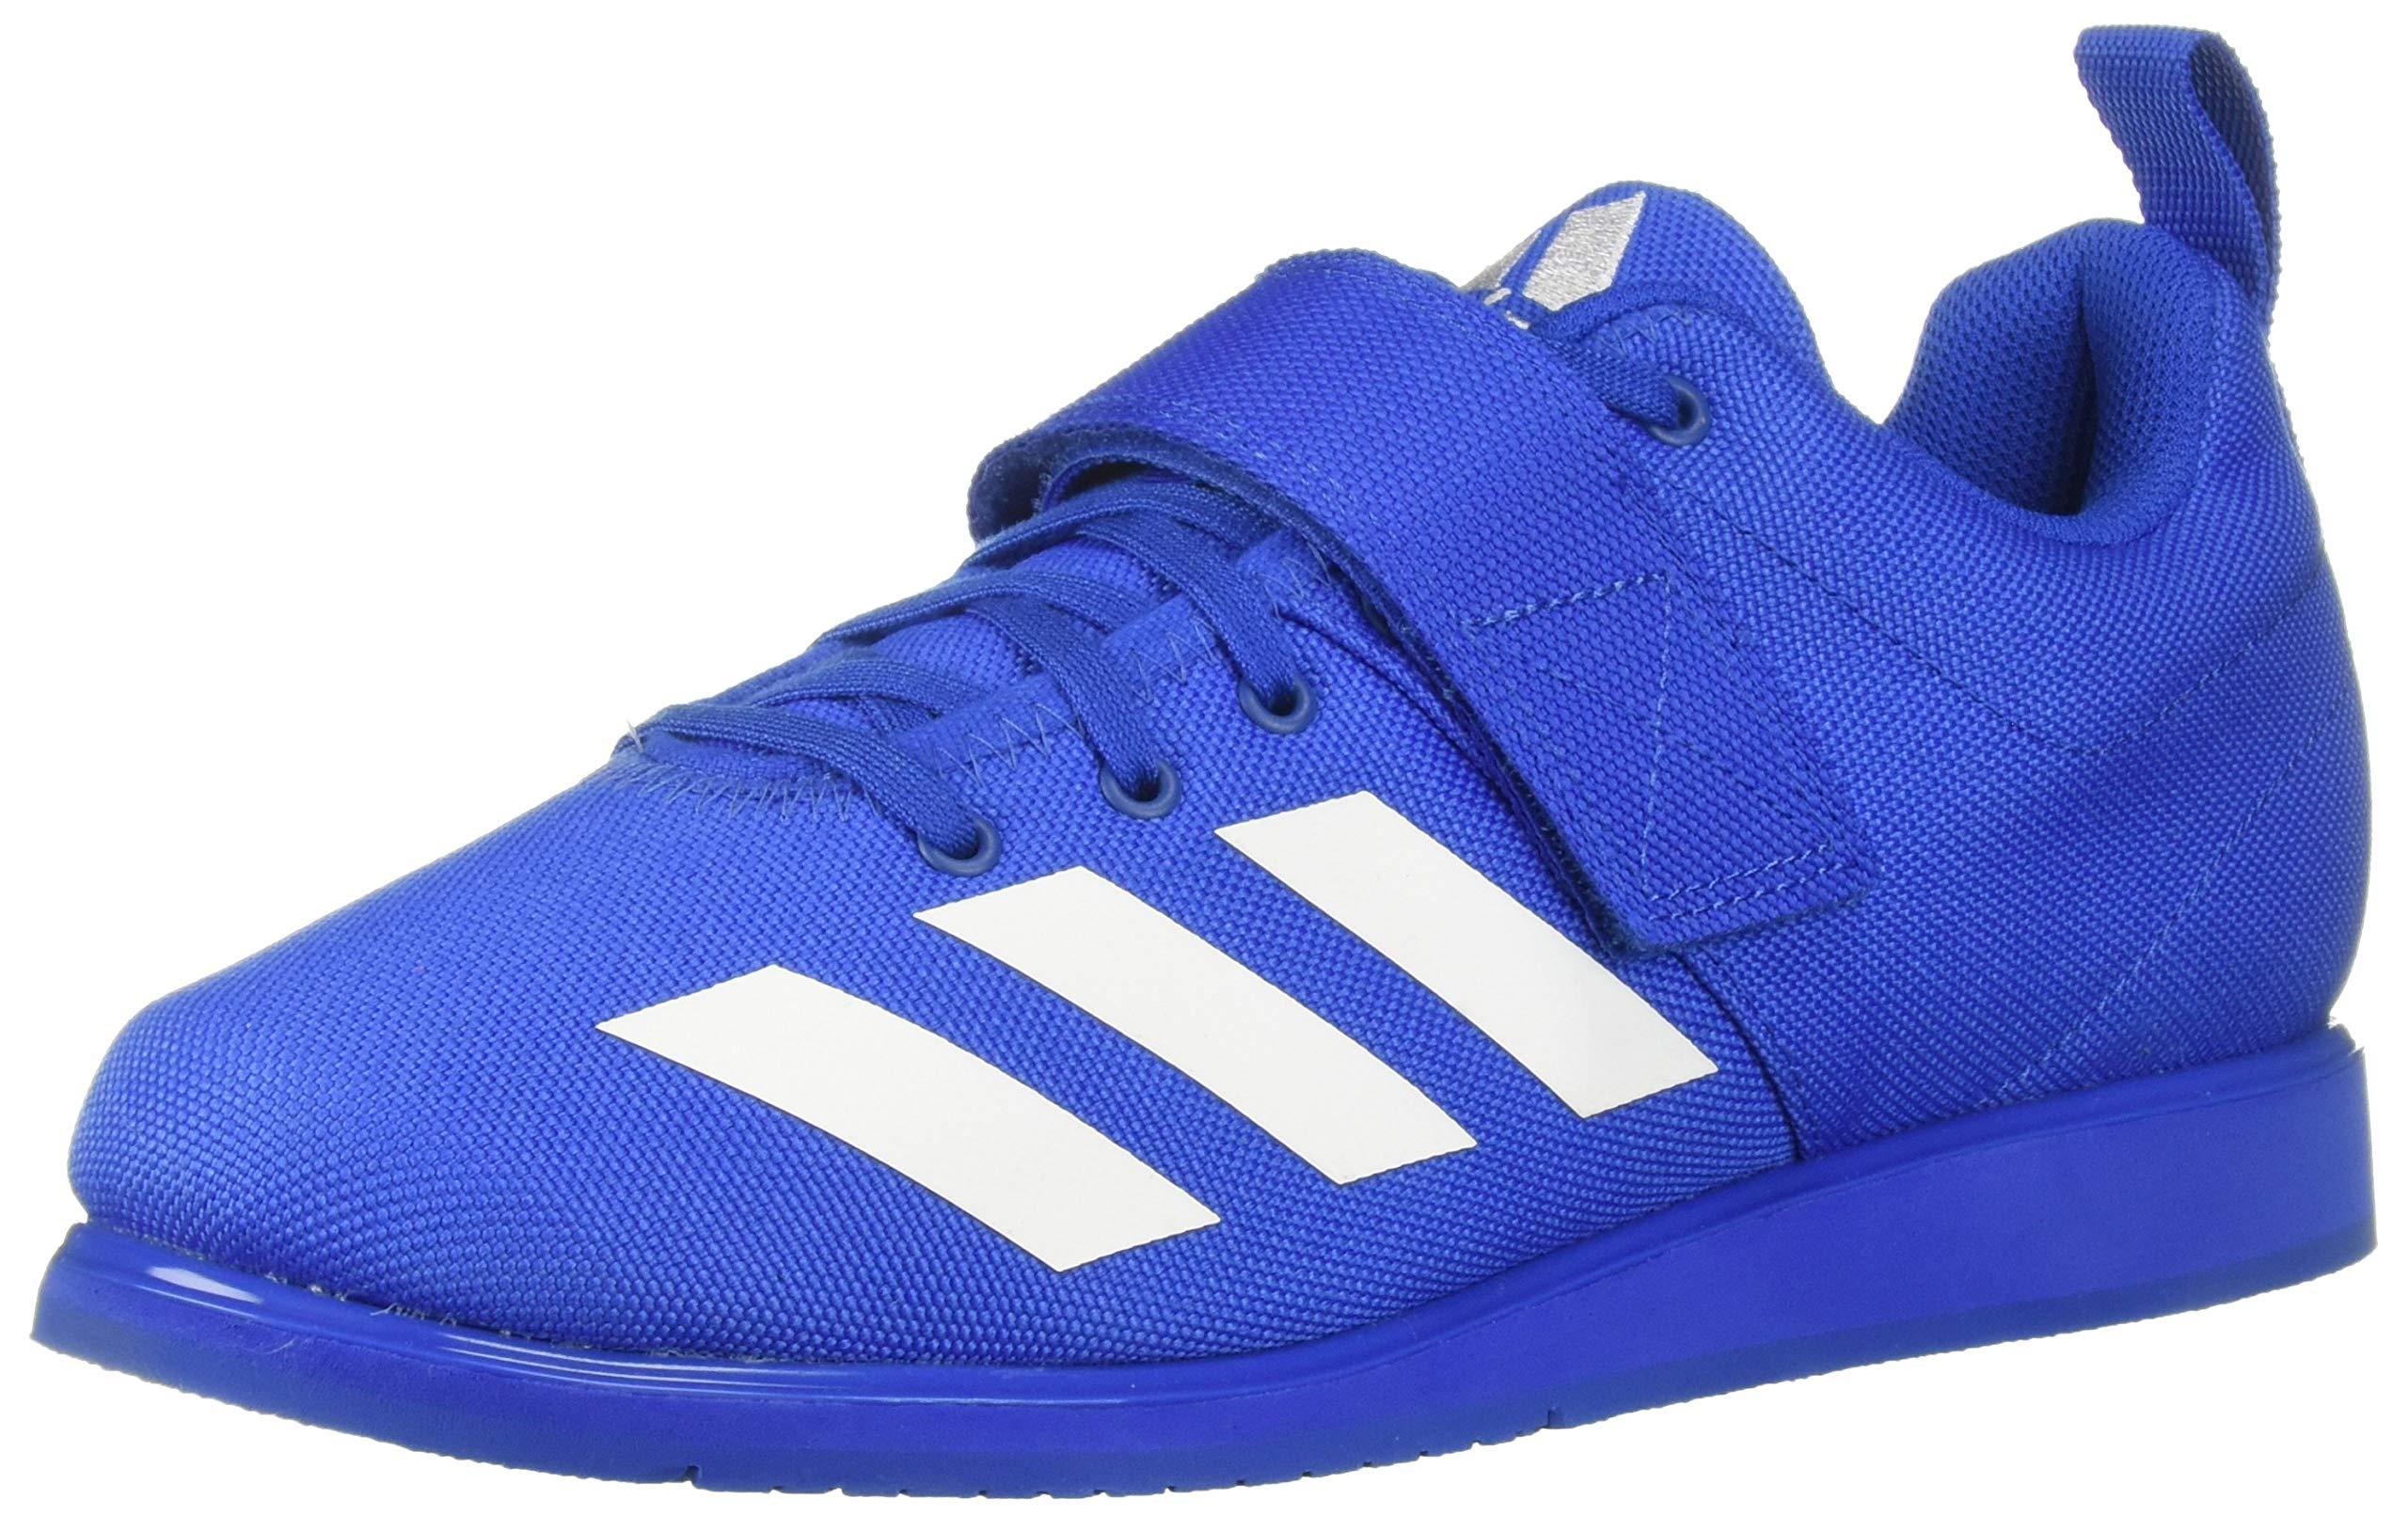 adidas Men's Powerlift 4, White/Blue, 4 M US